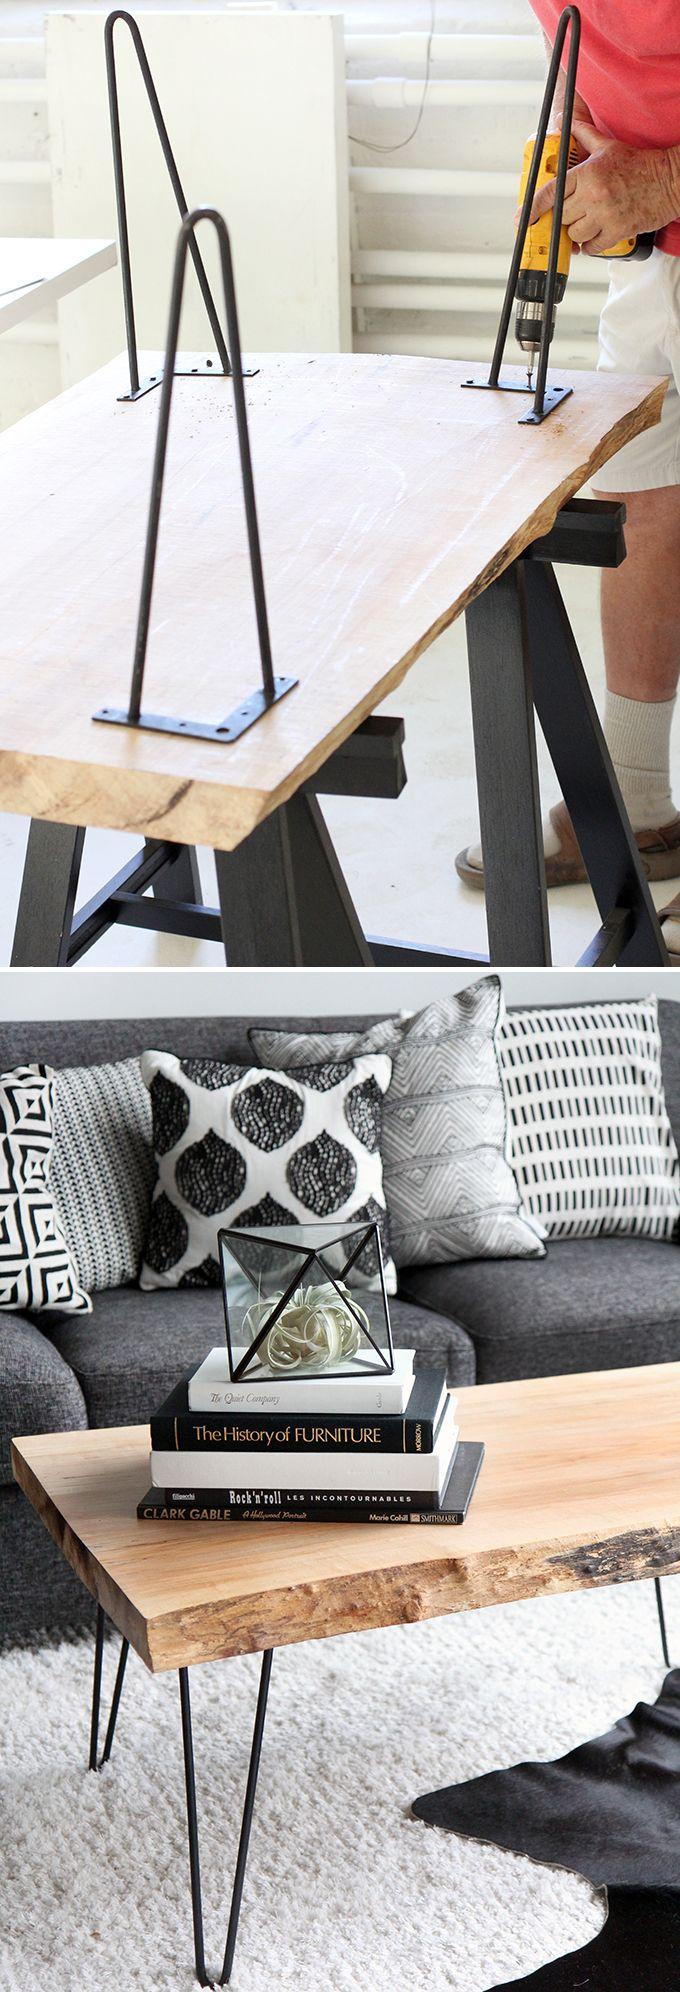 Wood slab coffee table with jenni of i spy diy minwax blog - Diy Wood Slab Coffee Table